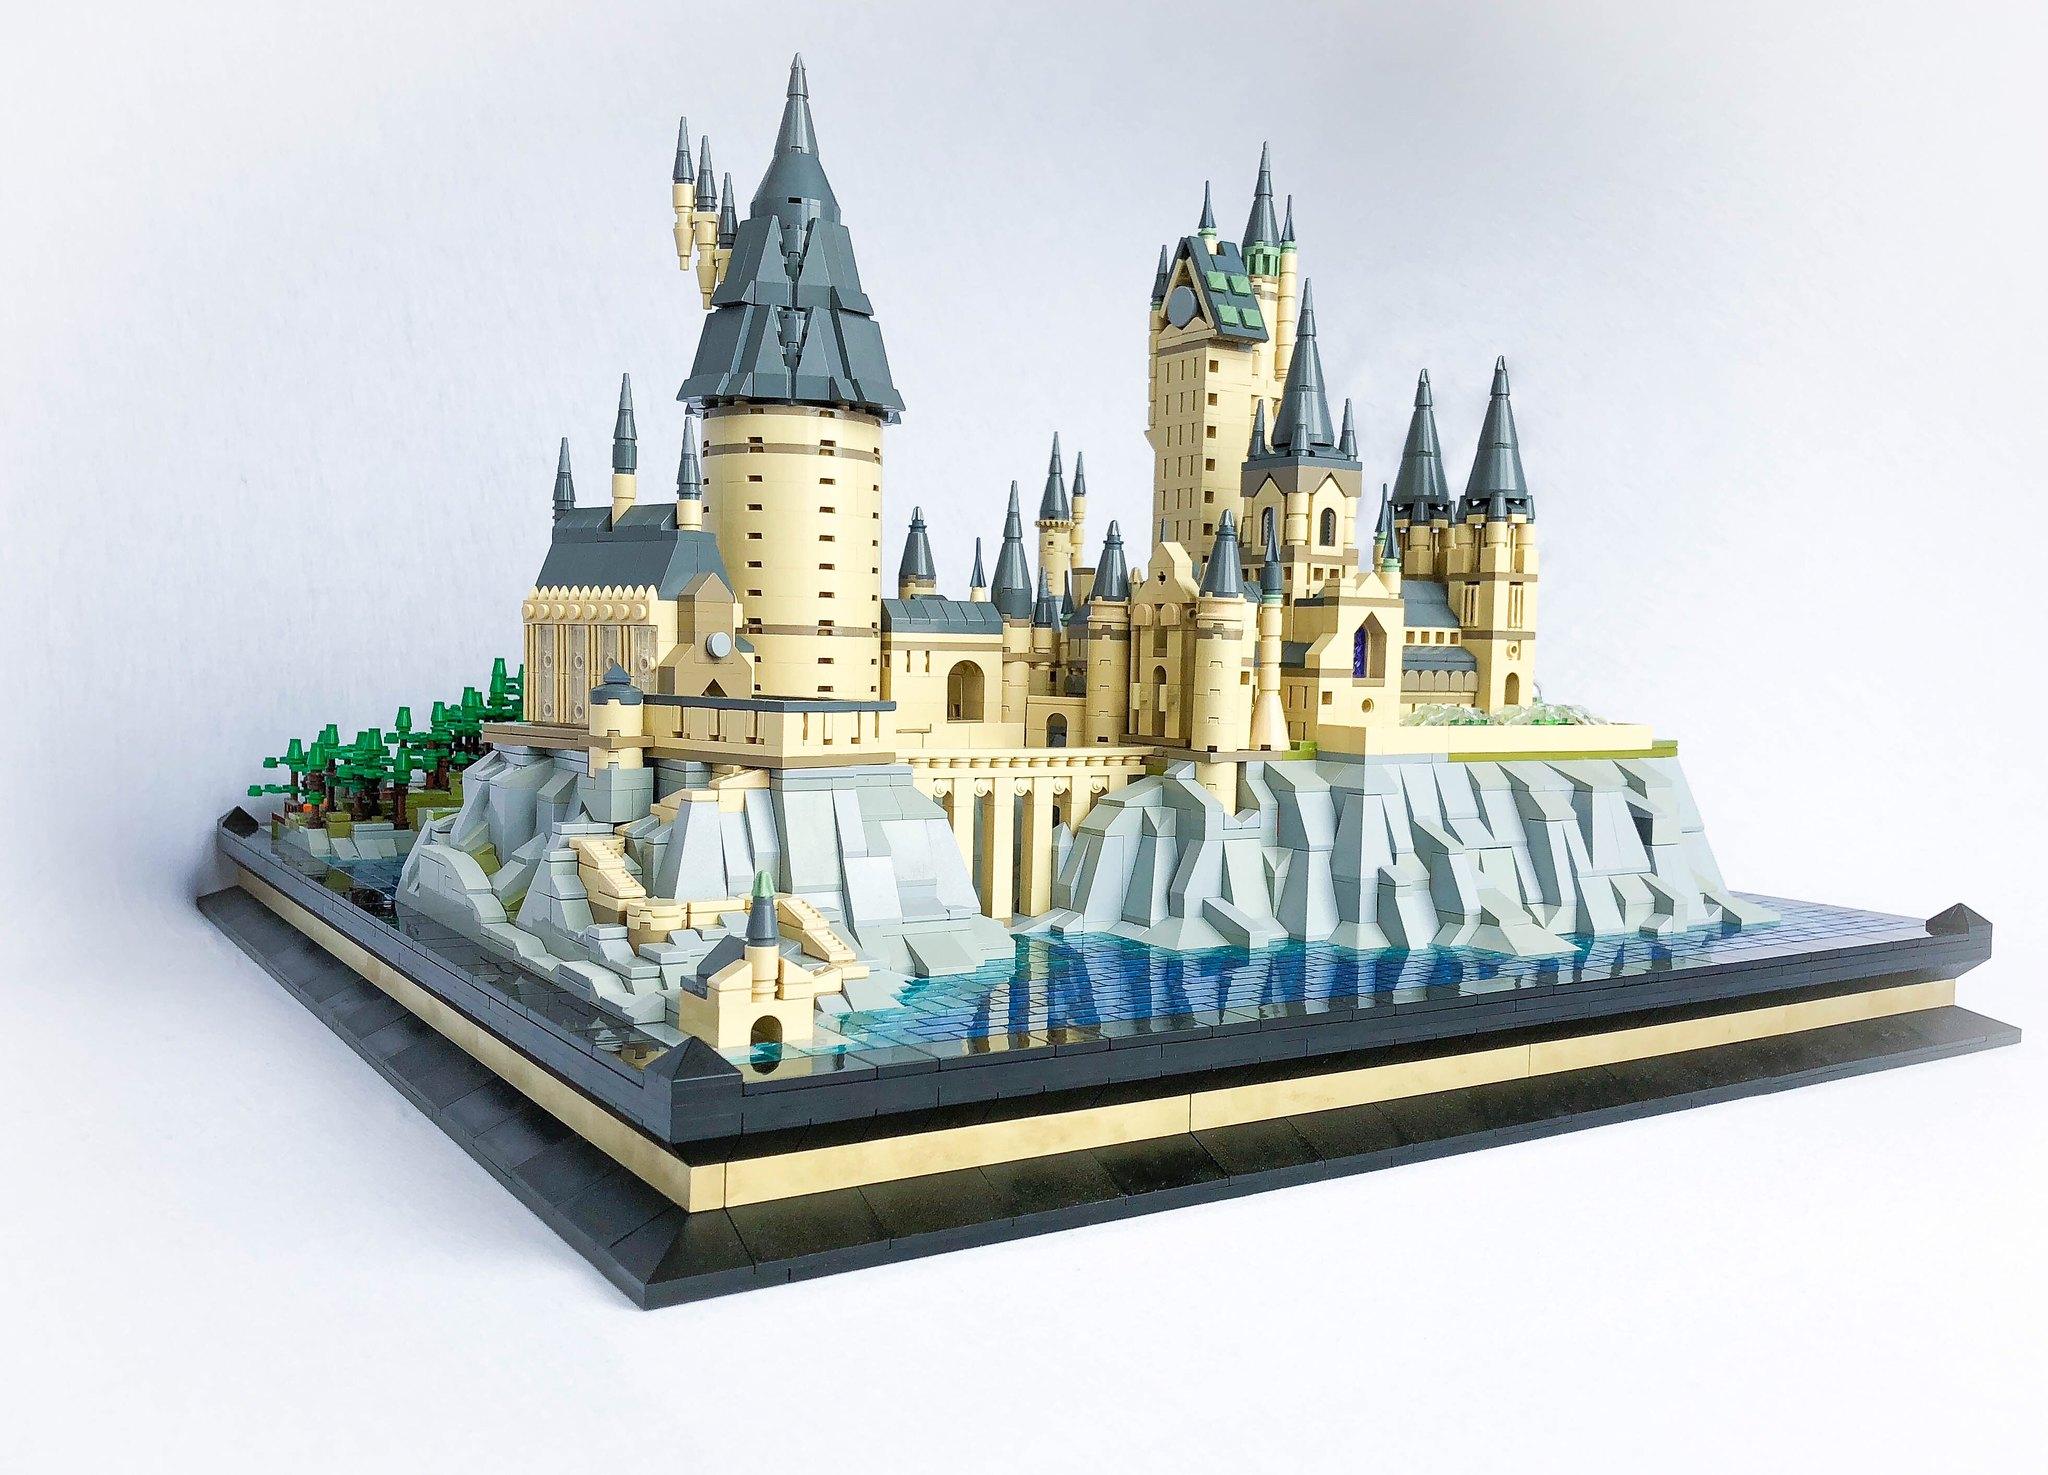 LEGO 71043 Microscale-Hogwarts: So könnte es aussehen